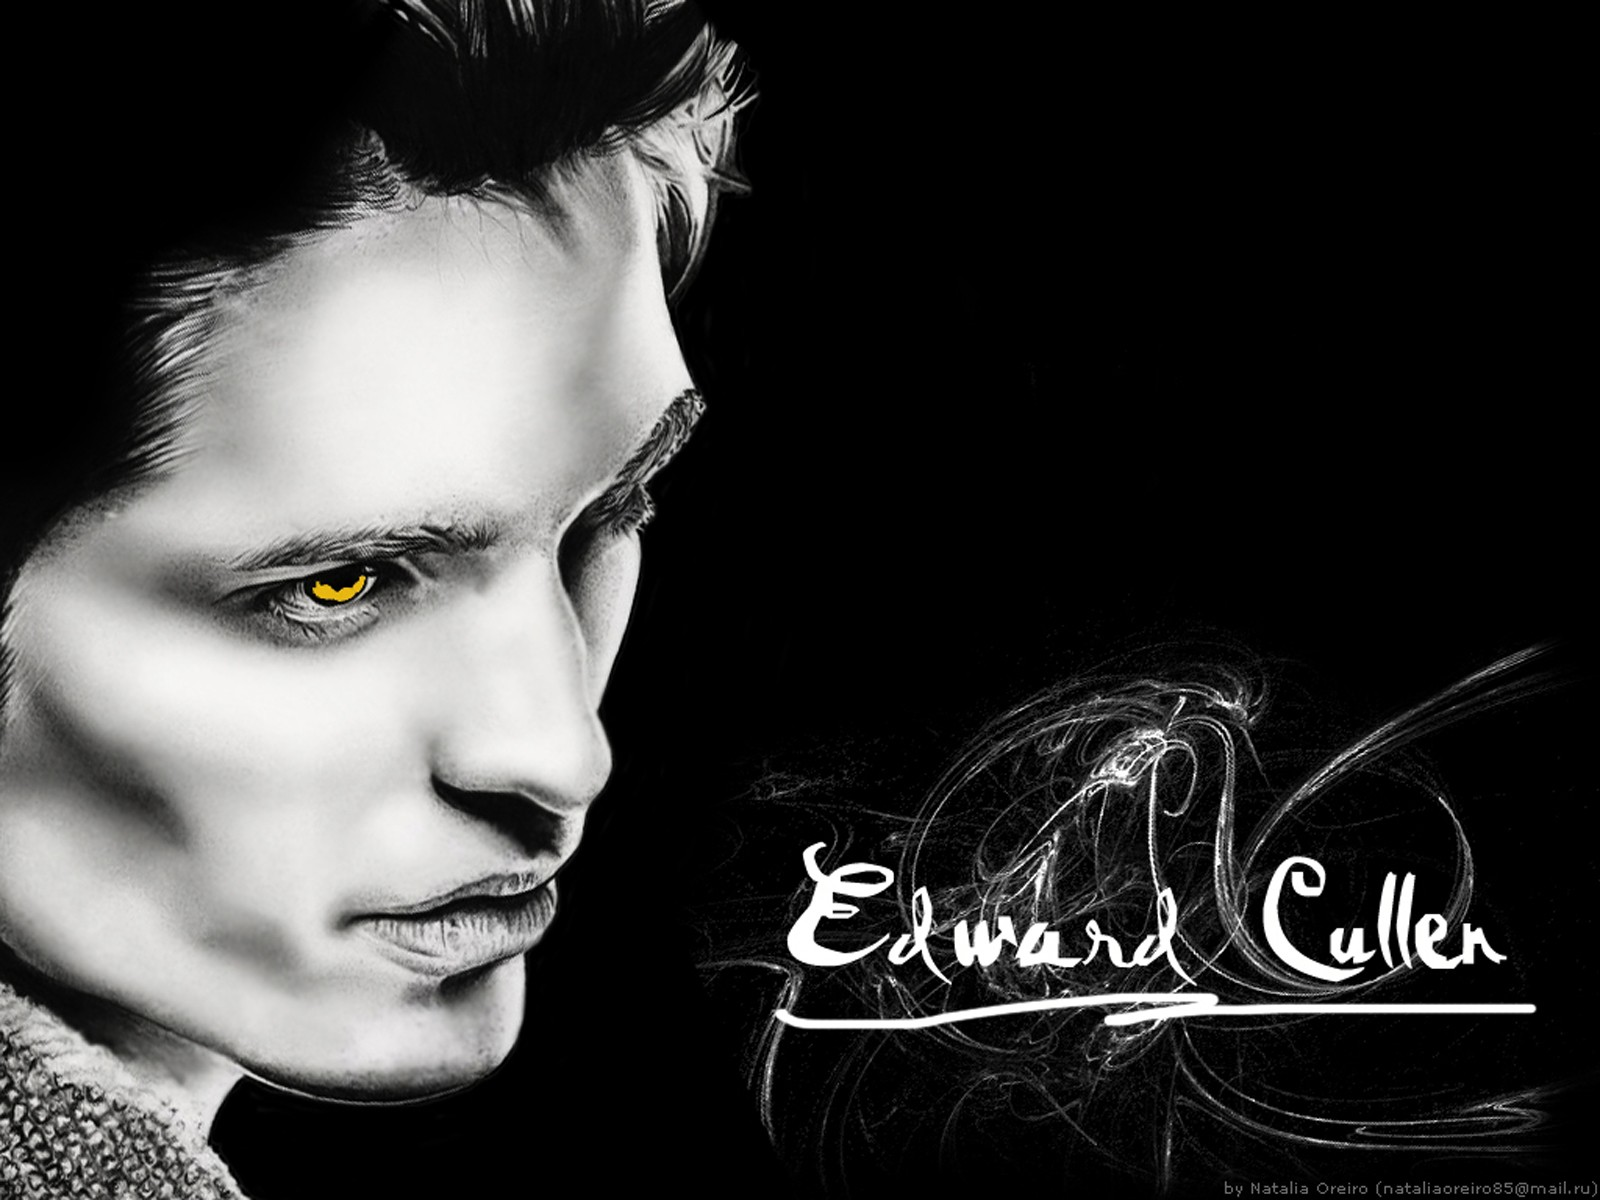 Эдвар Каллен, фото, обои для рабочего стола, вампир, Edward Cullen, wallpaper